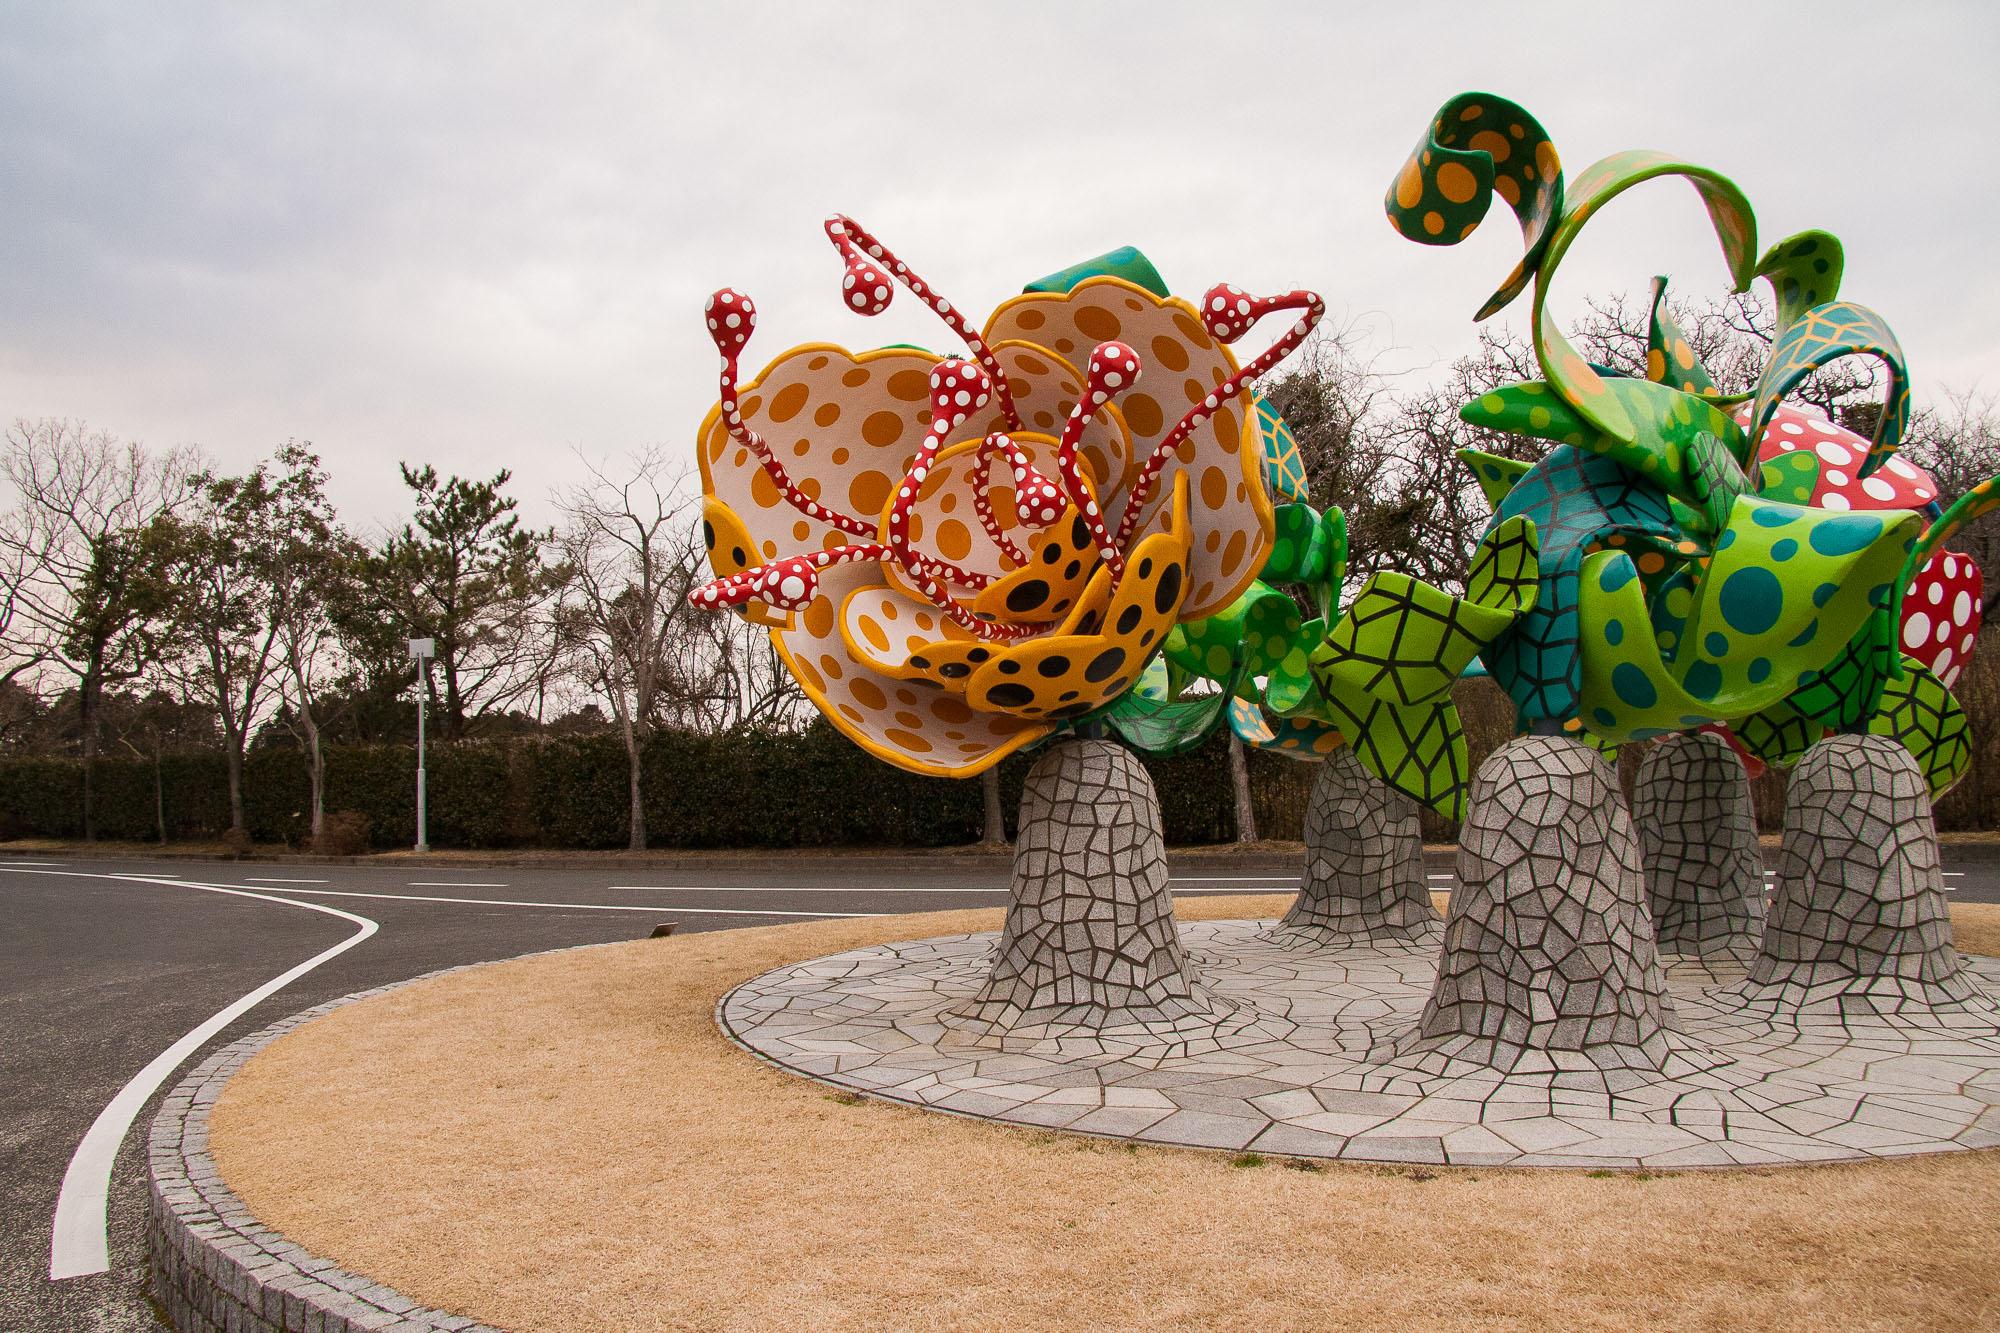 Flowers of Shangri-la, Yayoi Kusama, 2000